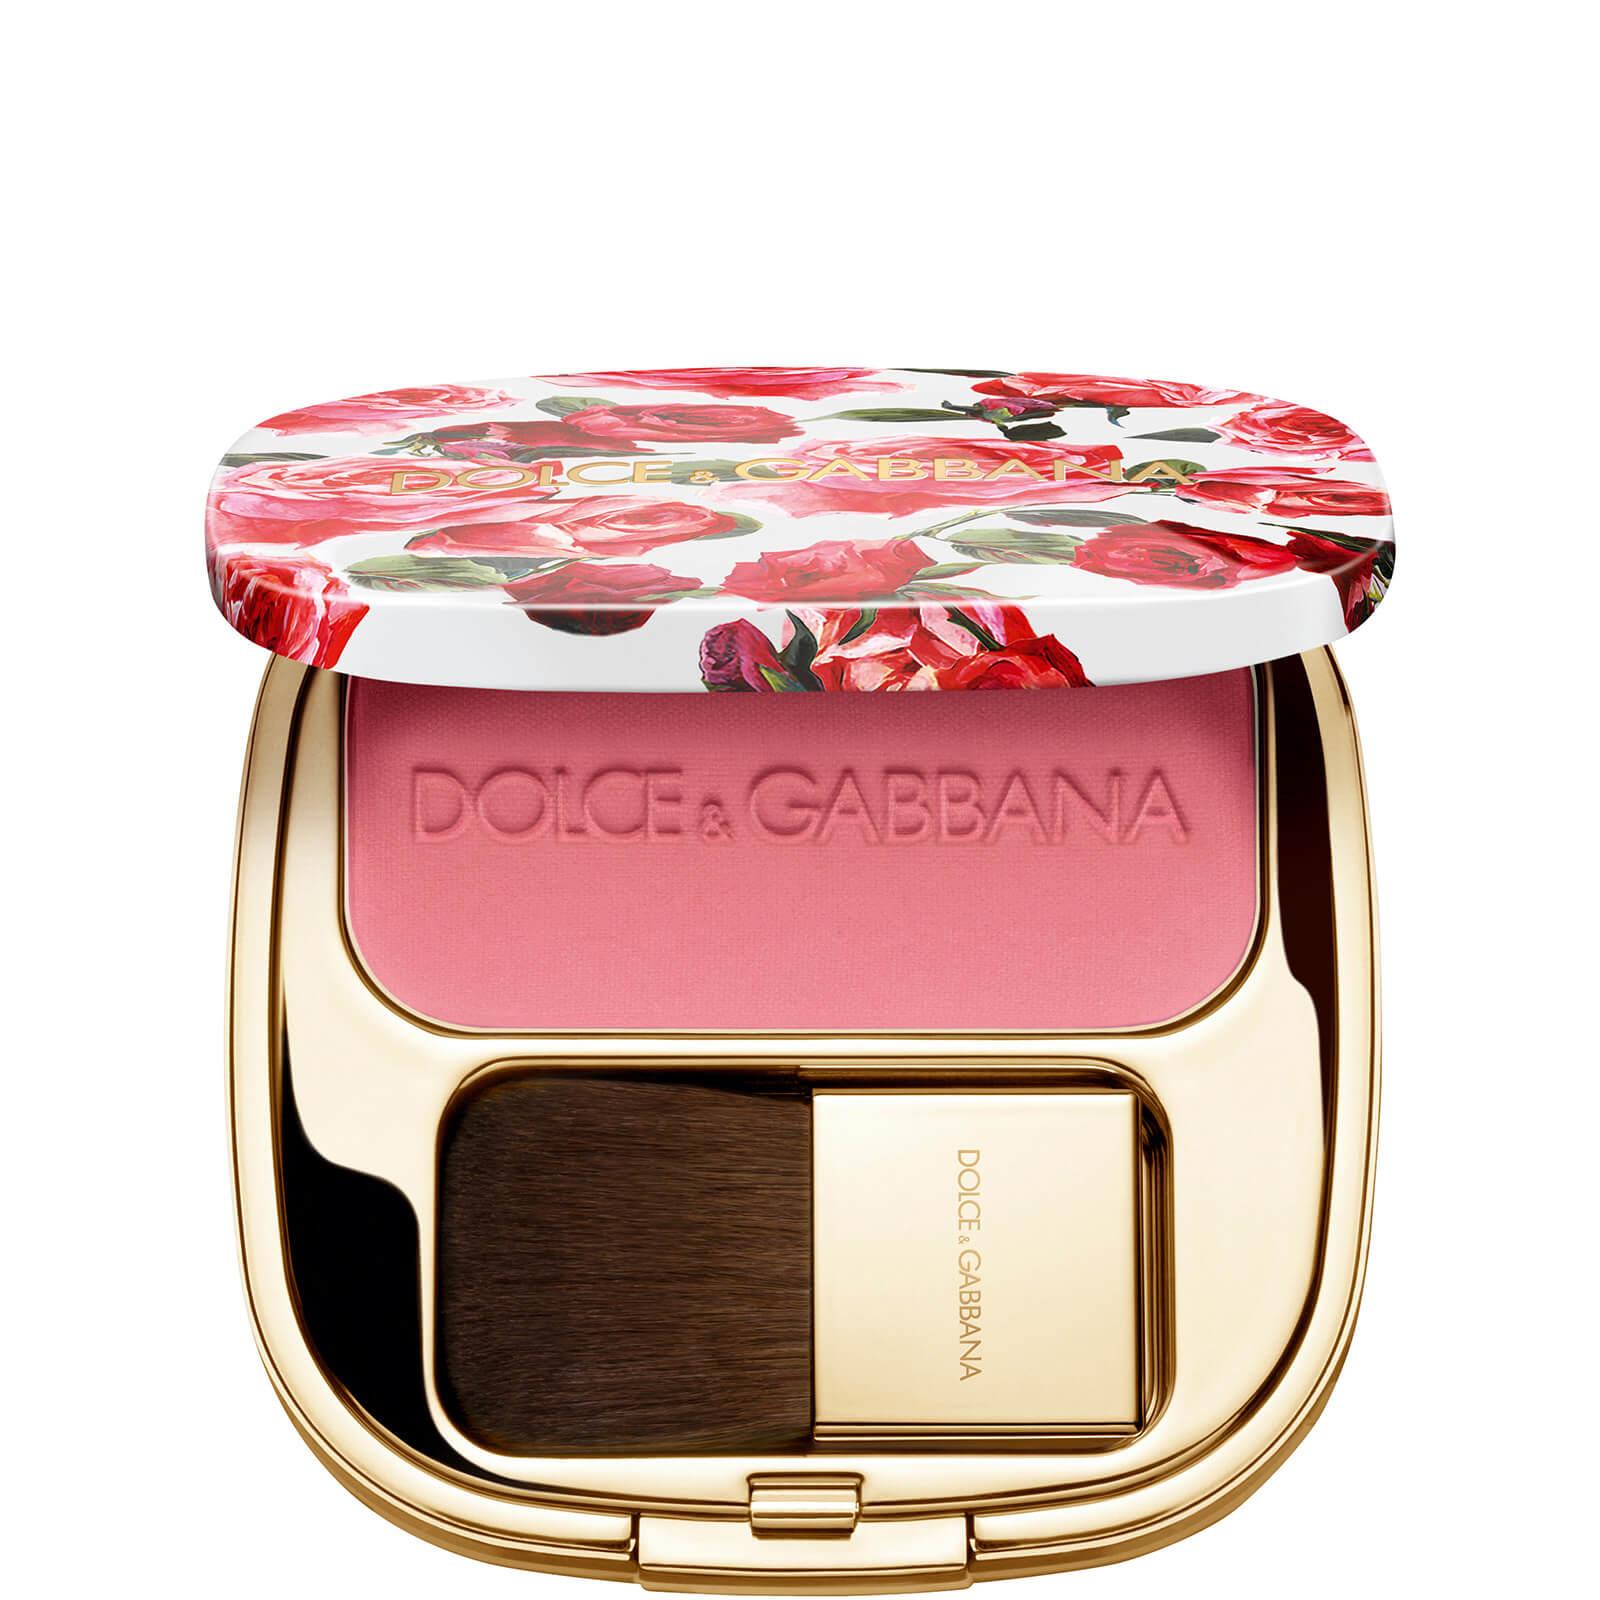 Купить Dolce&Gabbana Blush of Roses Luminous Cheek Colour 5g (Various Shades) - 200 Provative